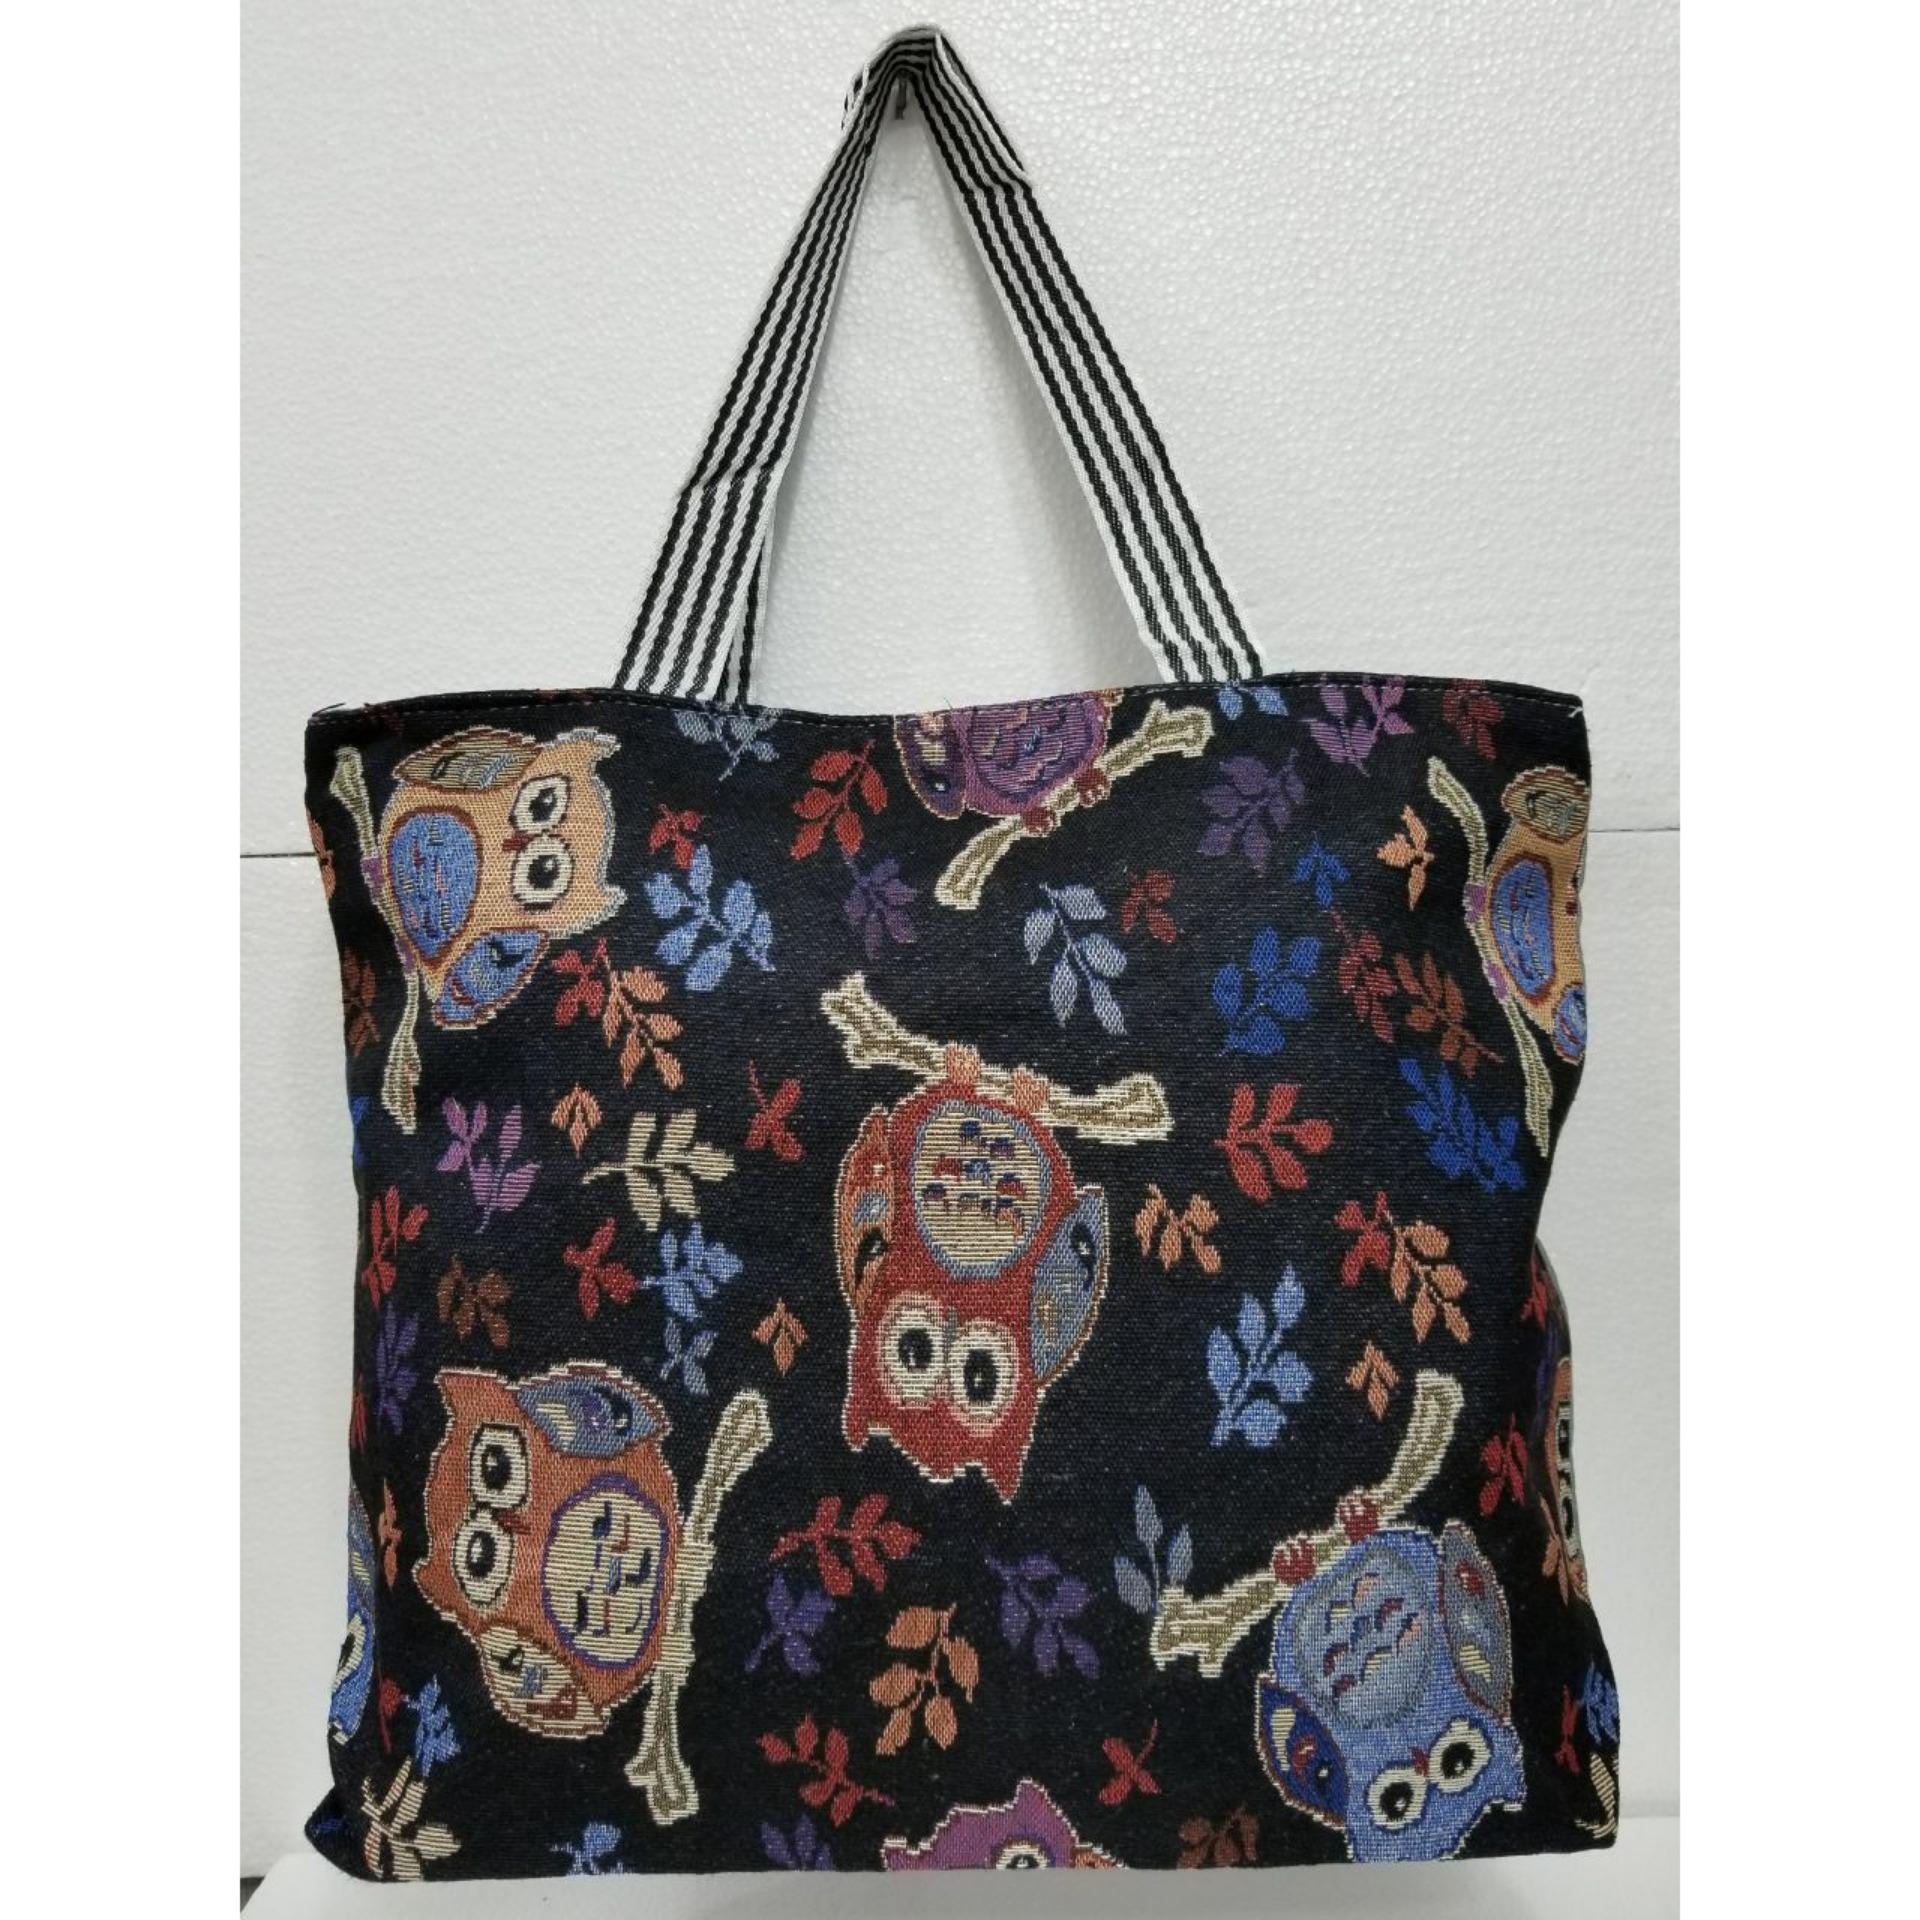 Jahitan rapi dan kuat Universal Tas Fashion Wanita Tote Bag Canvas-Motif owl hitam